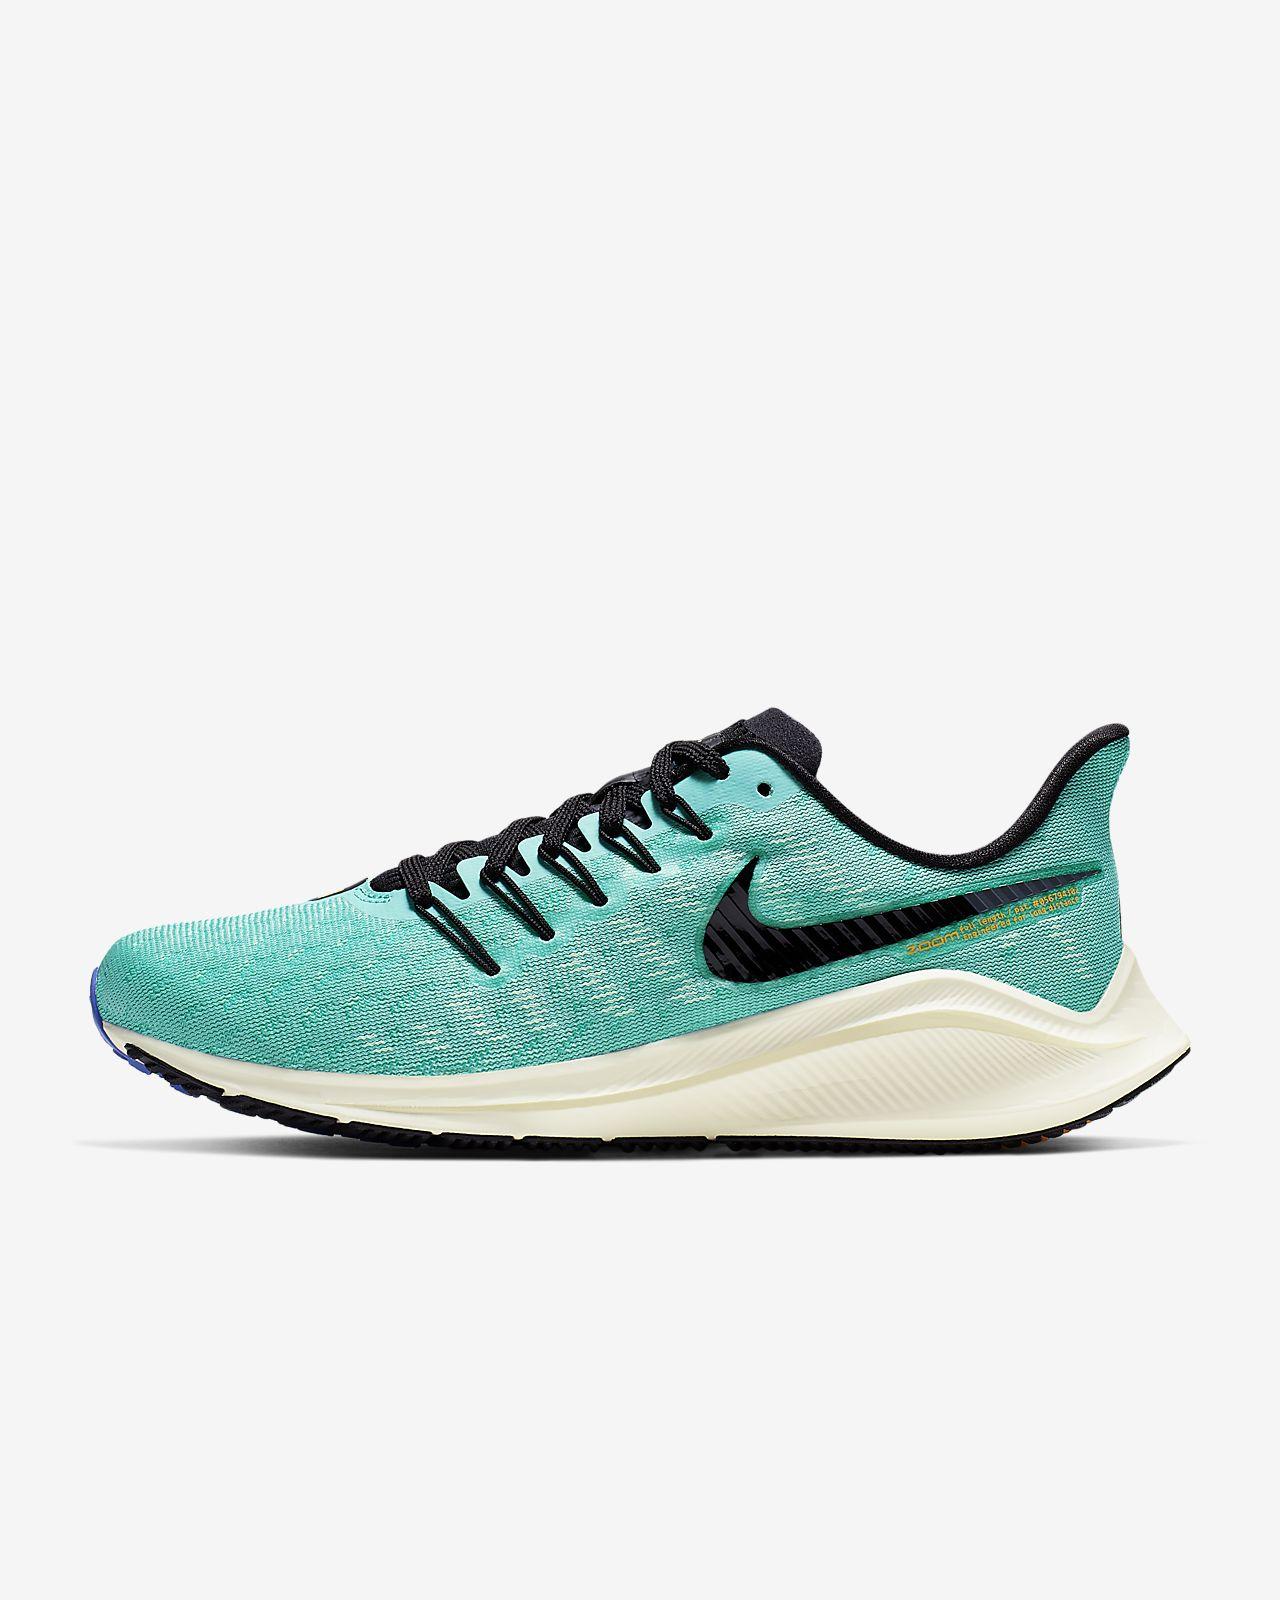 Nike Air Zoom Vomero 14 Damen Laufschuh